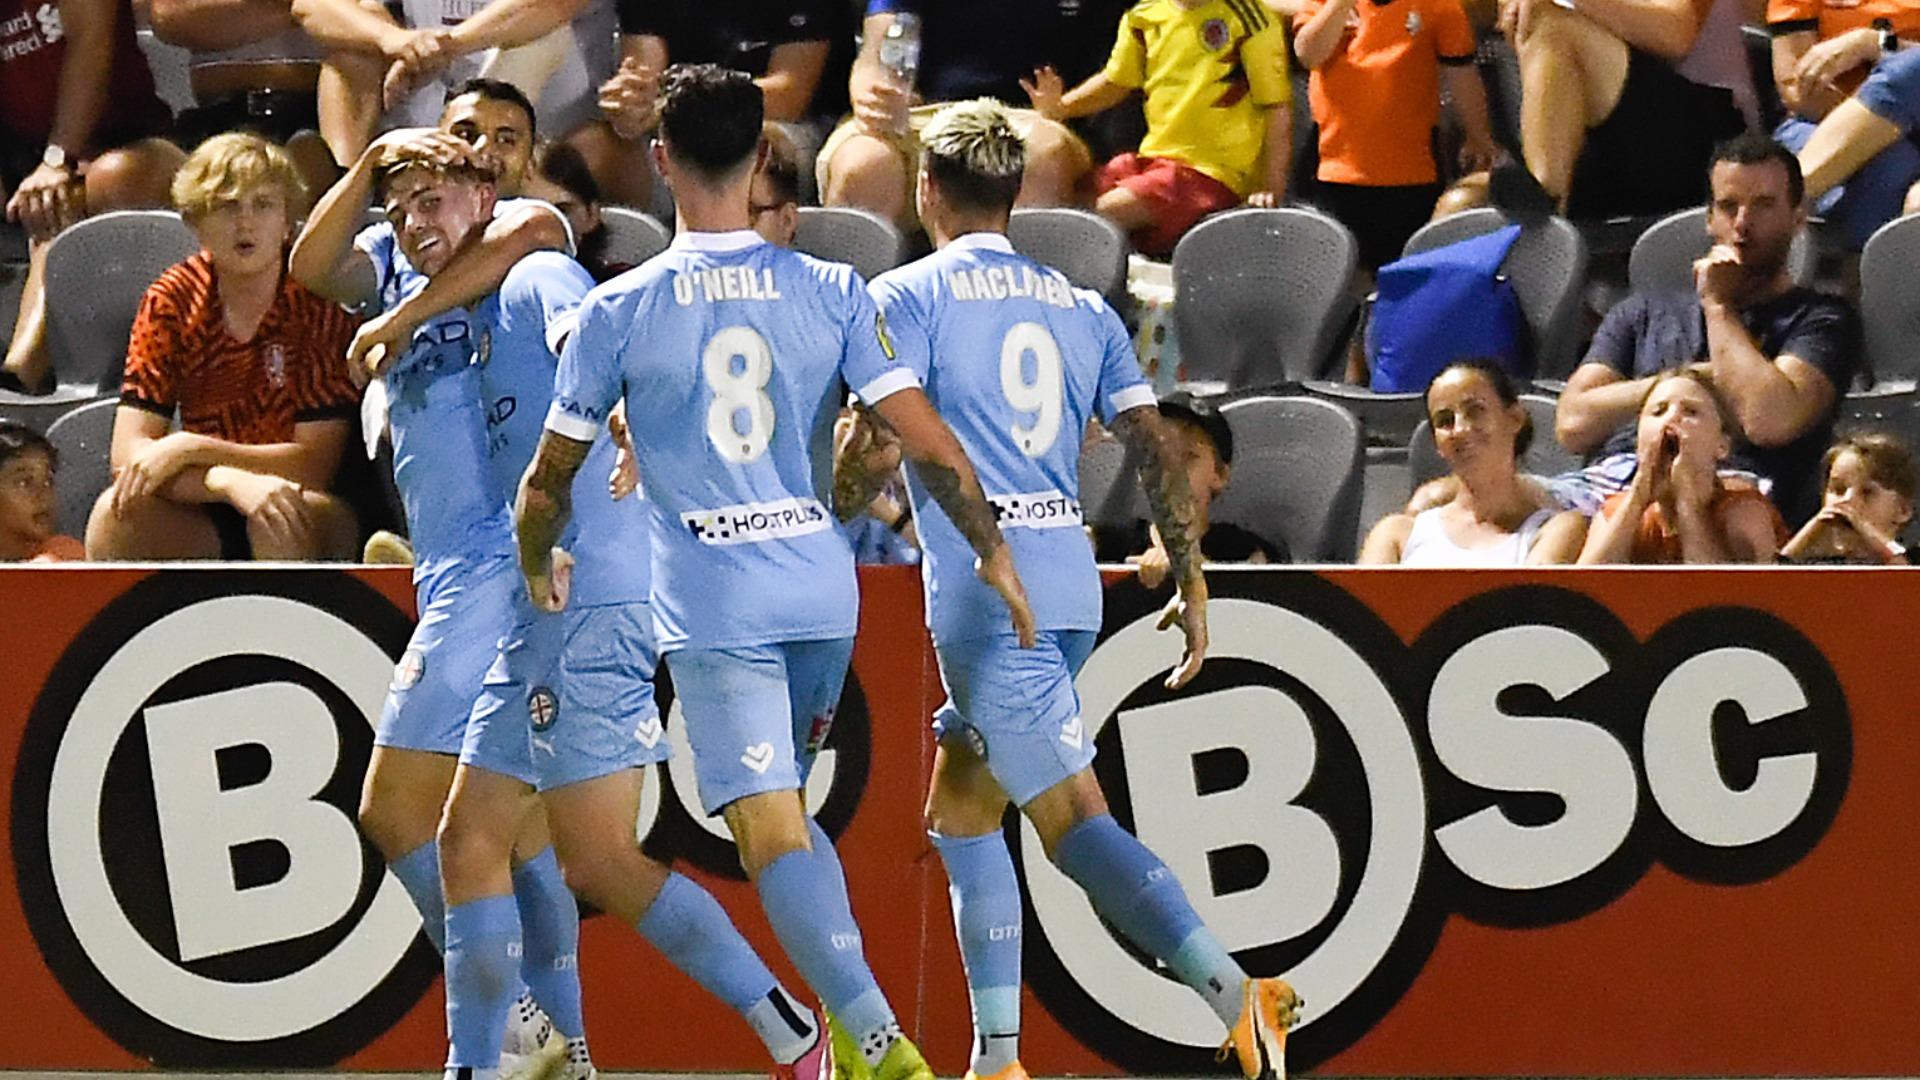 Brisbane Roar 0-1 Melbourne City: Metcalfe gets Kisnorbo off to winning start